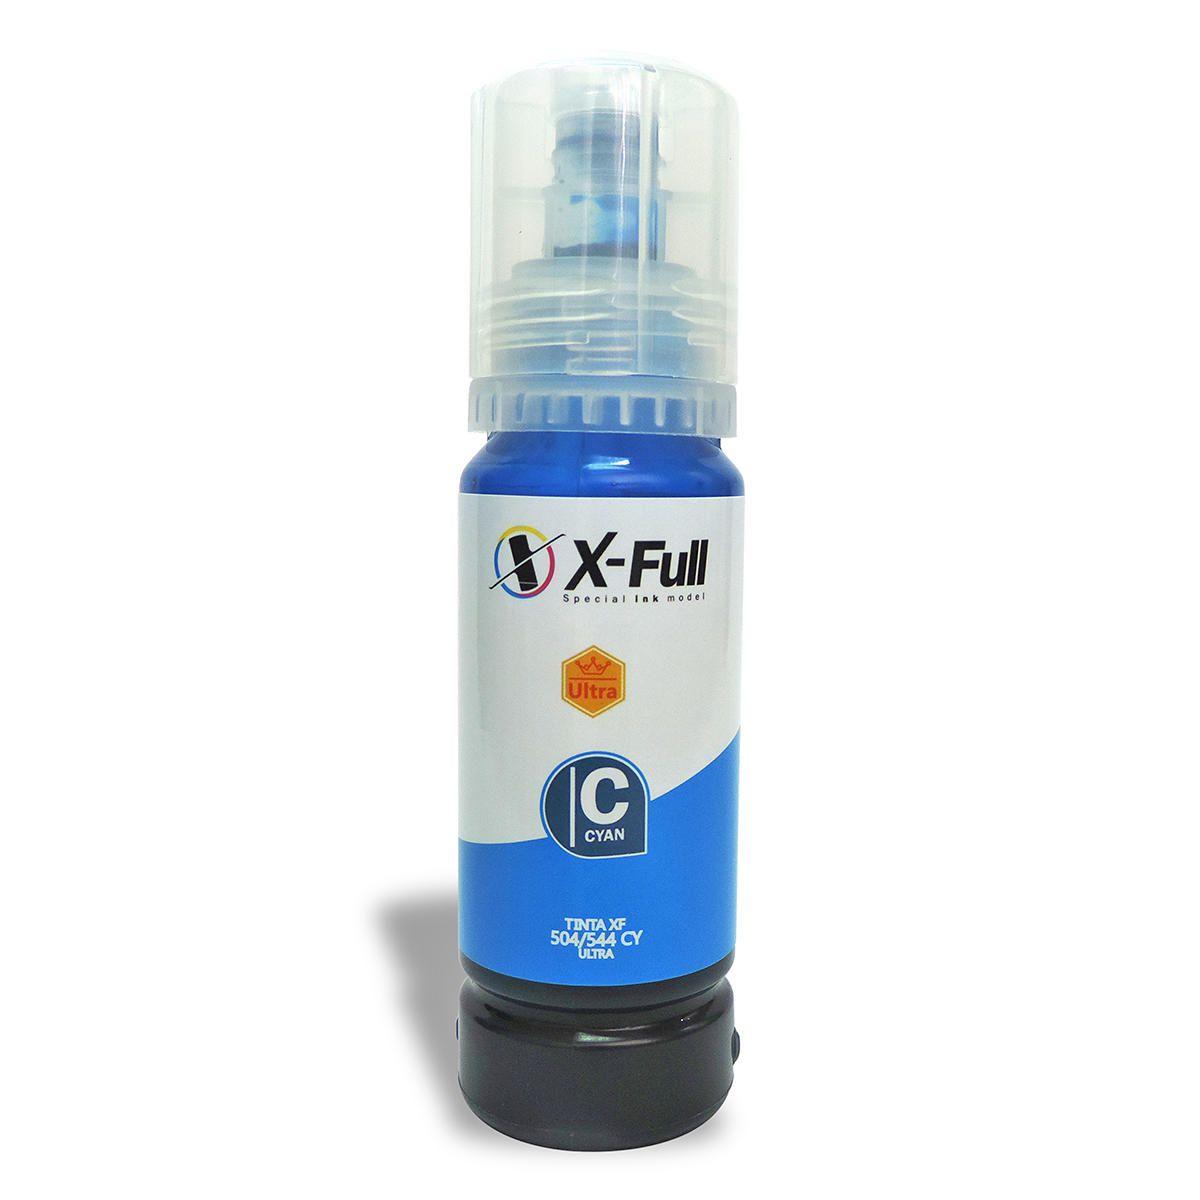 Compatível: Tinta Corante X-Full Ultra para Epson L3110 L3111 L3158 L4150 L4168 L6160 L6168 L6178 / Ciano / 70ml